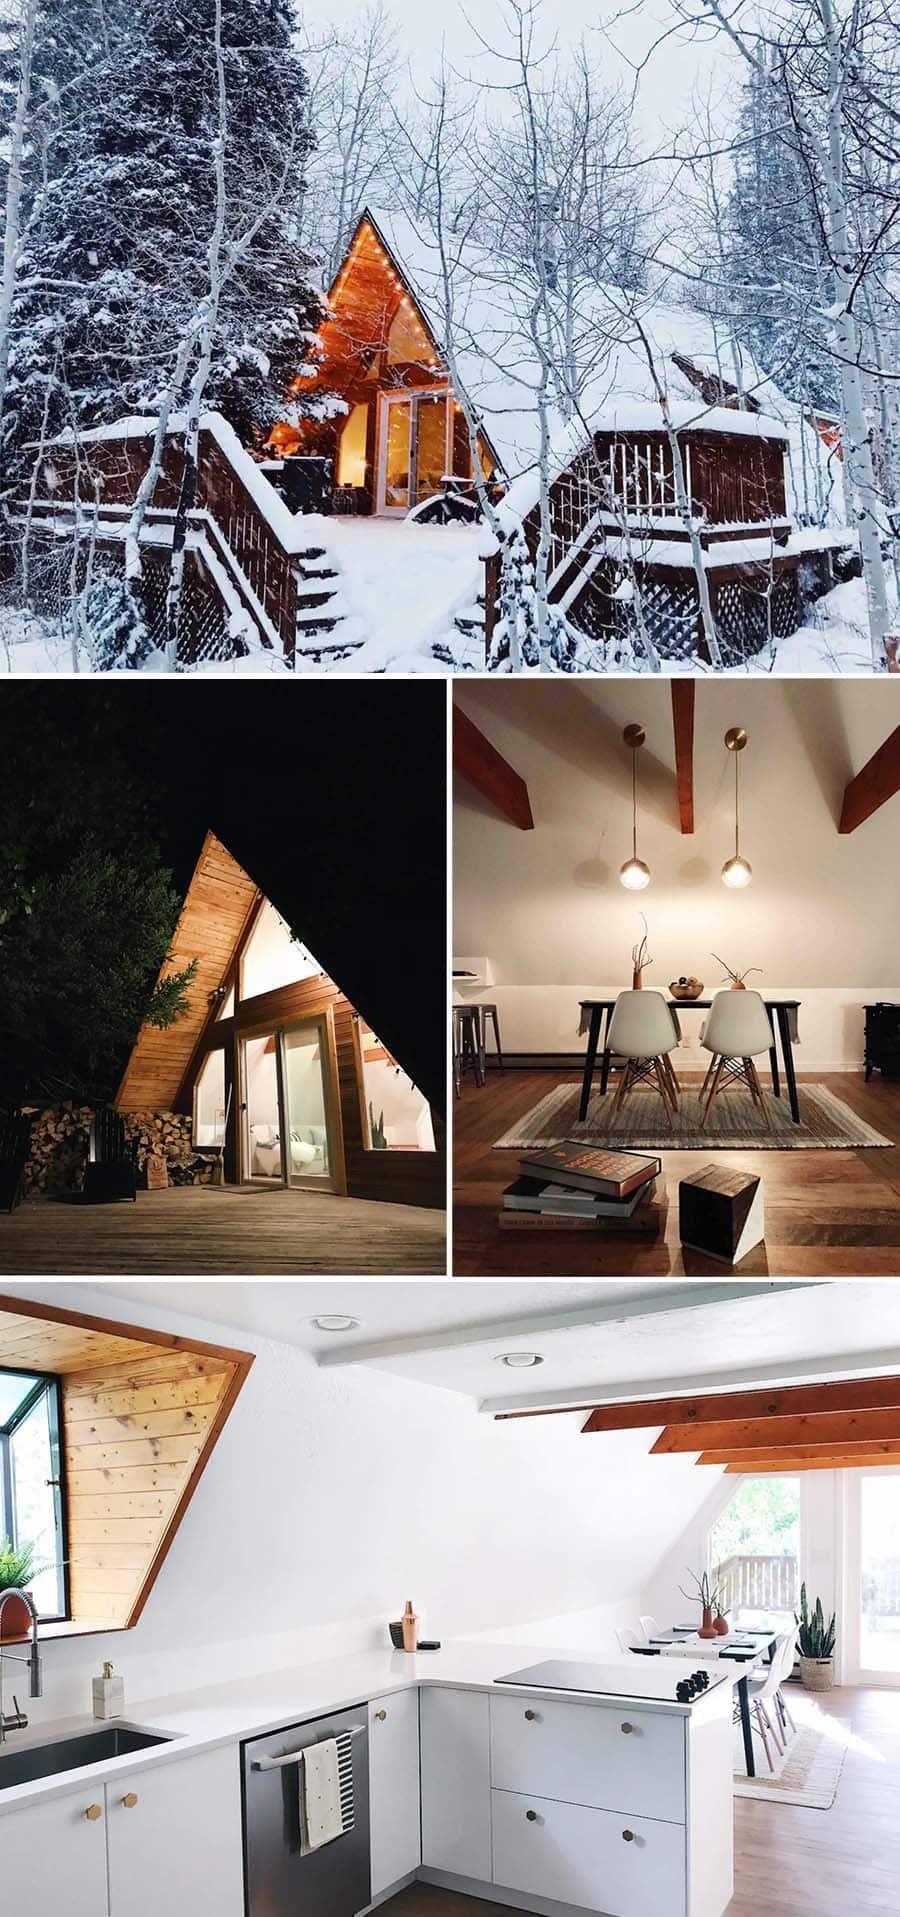 Cottonwood Chalet, Winter cabin